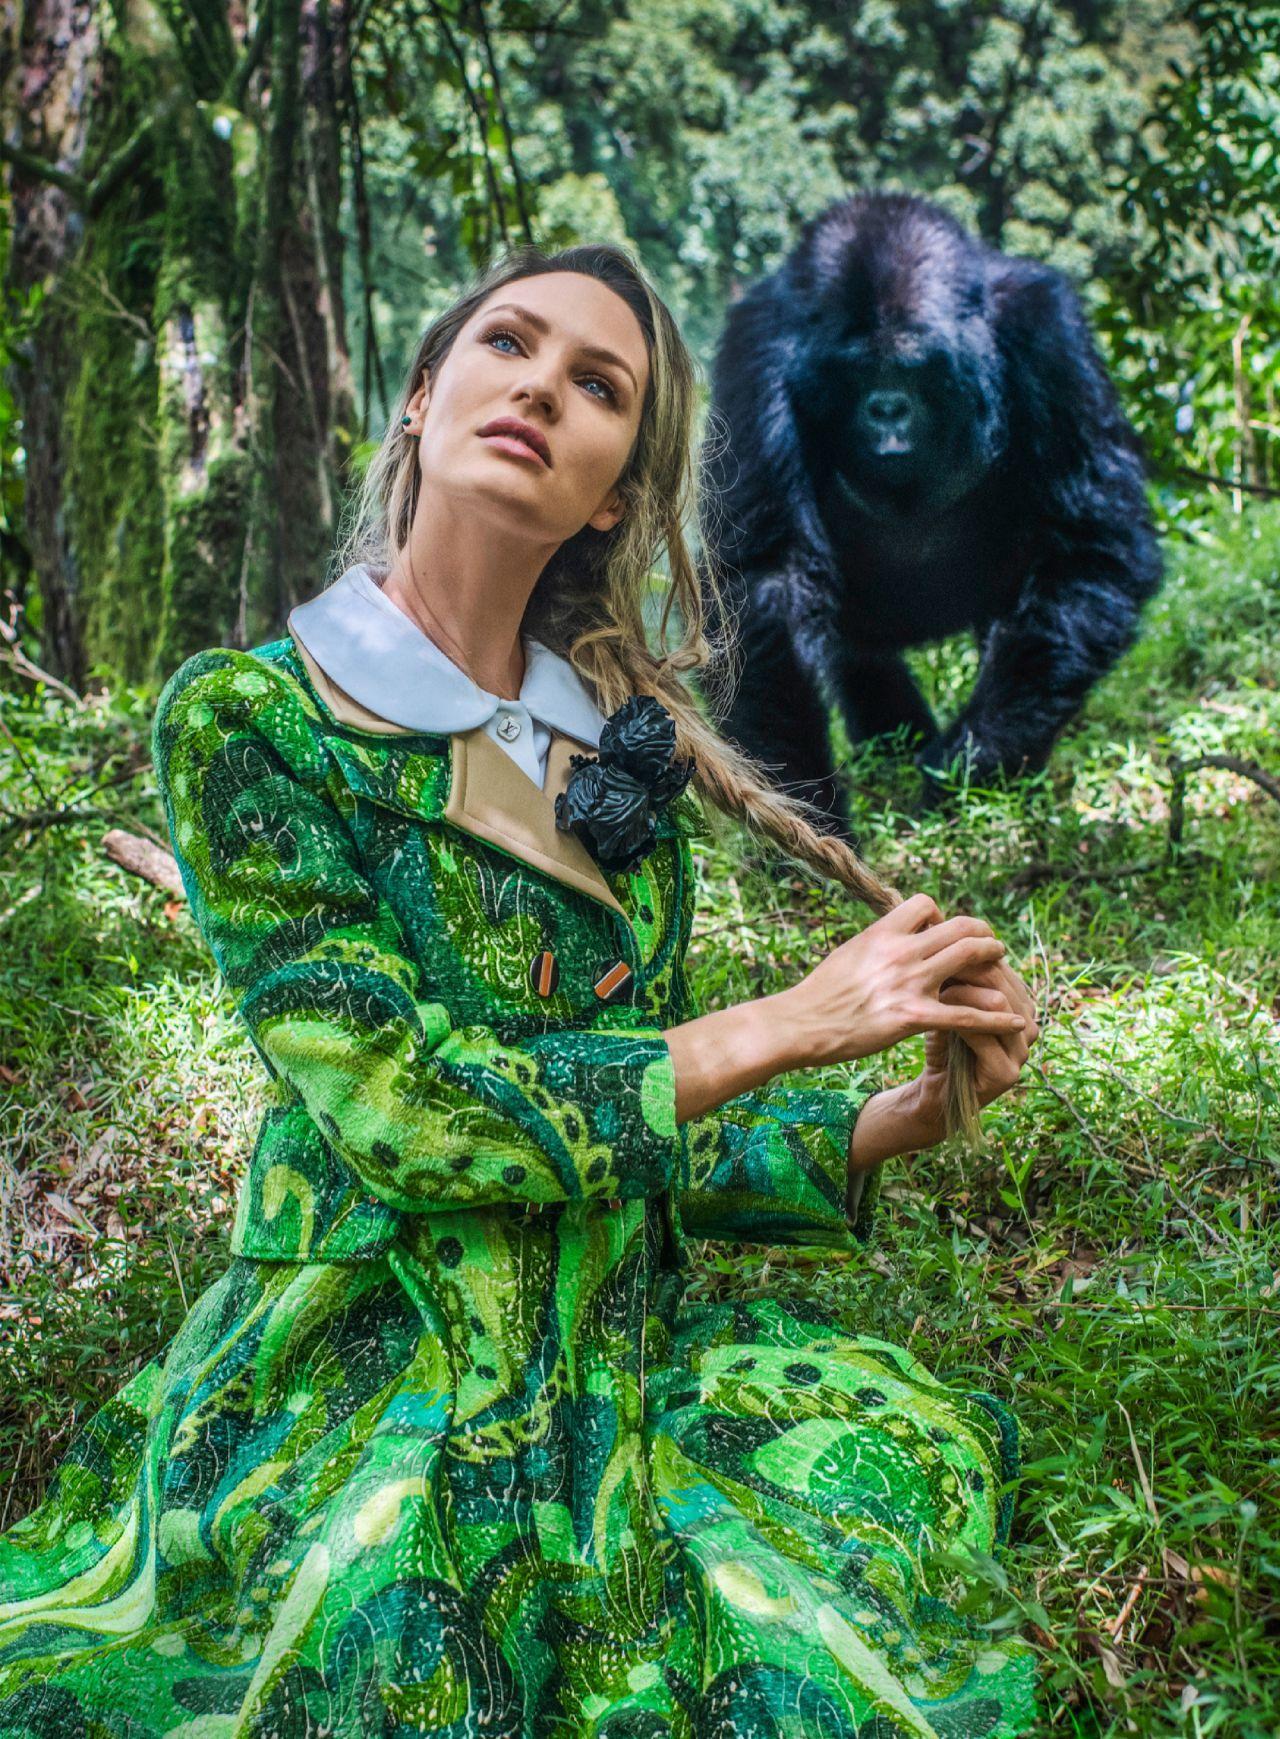 坎蒂丝·斯瓦内普尔(Candice Swanepoel)-Harper's Bazaar美国2020年